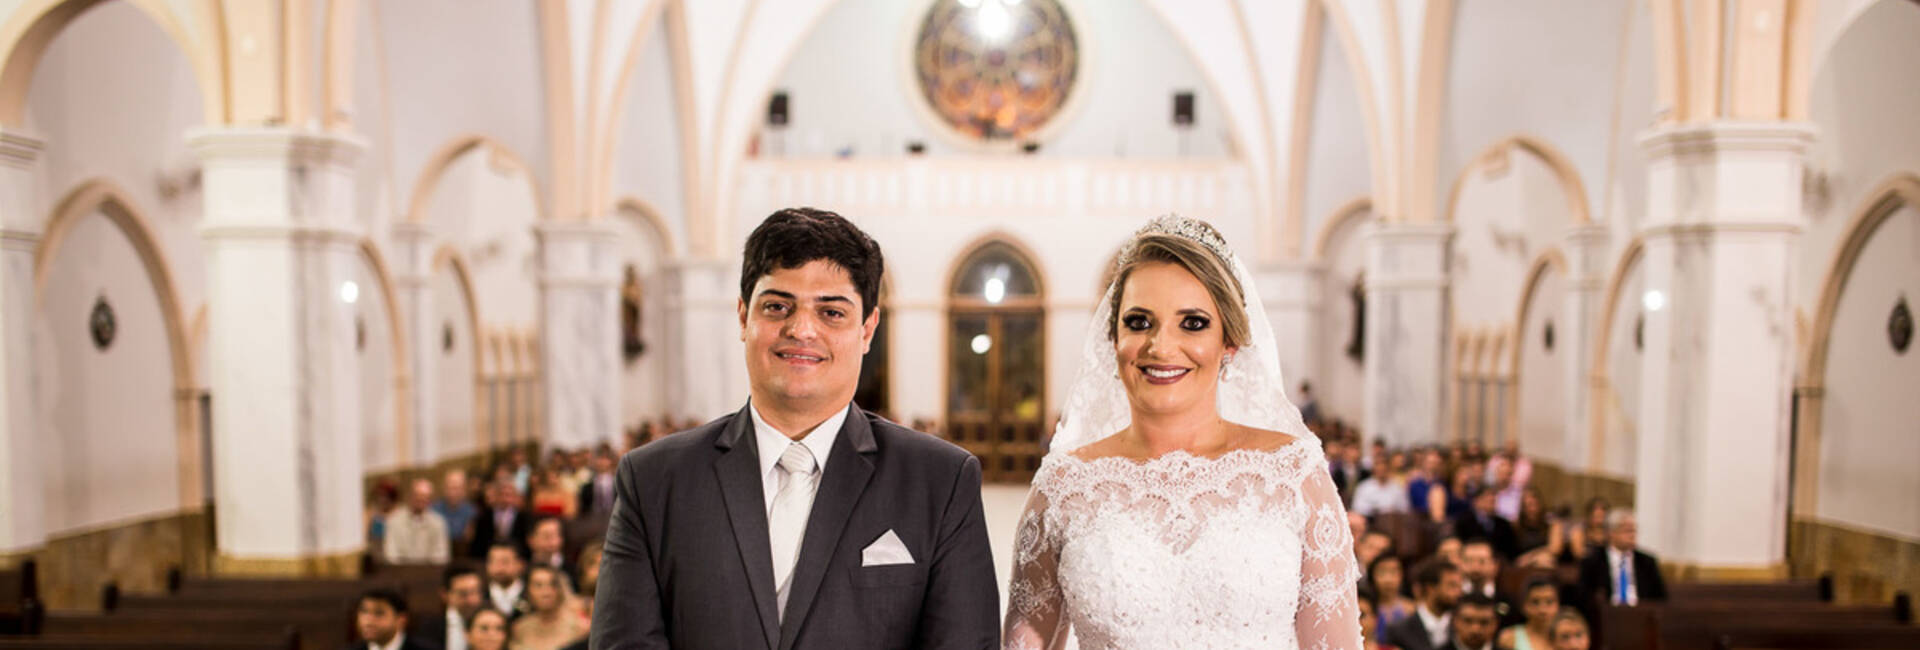 Casamento de Maria Alice & Marcelo